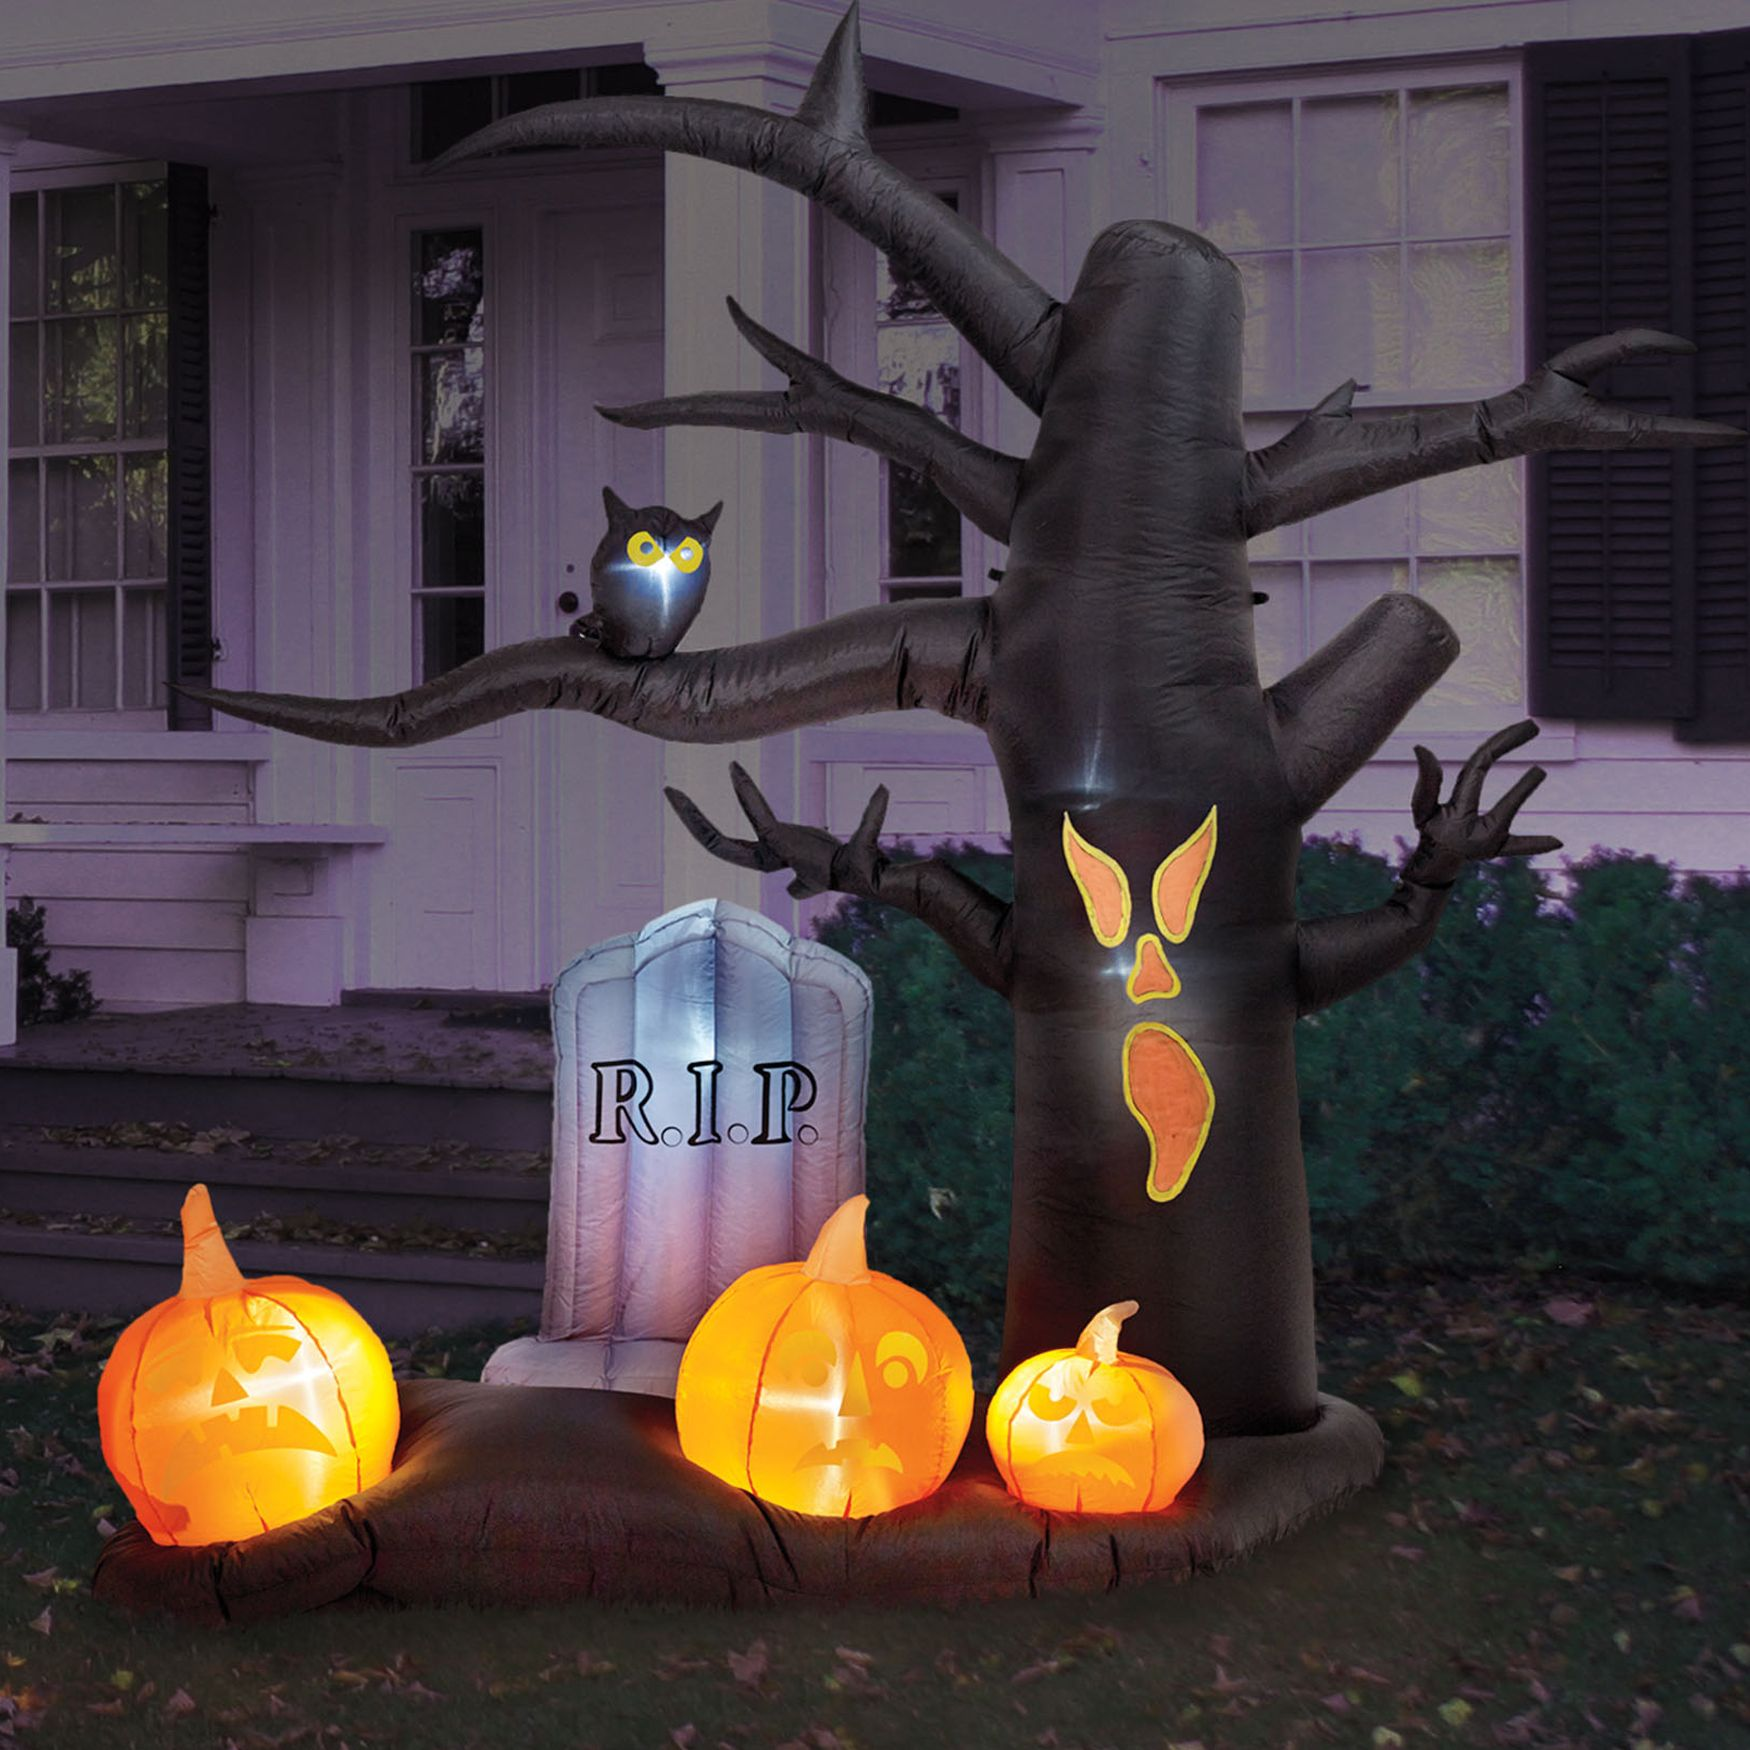 Spooky 8' Inflatable Tree Halloween outdoor decorations